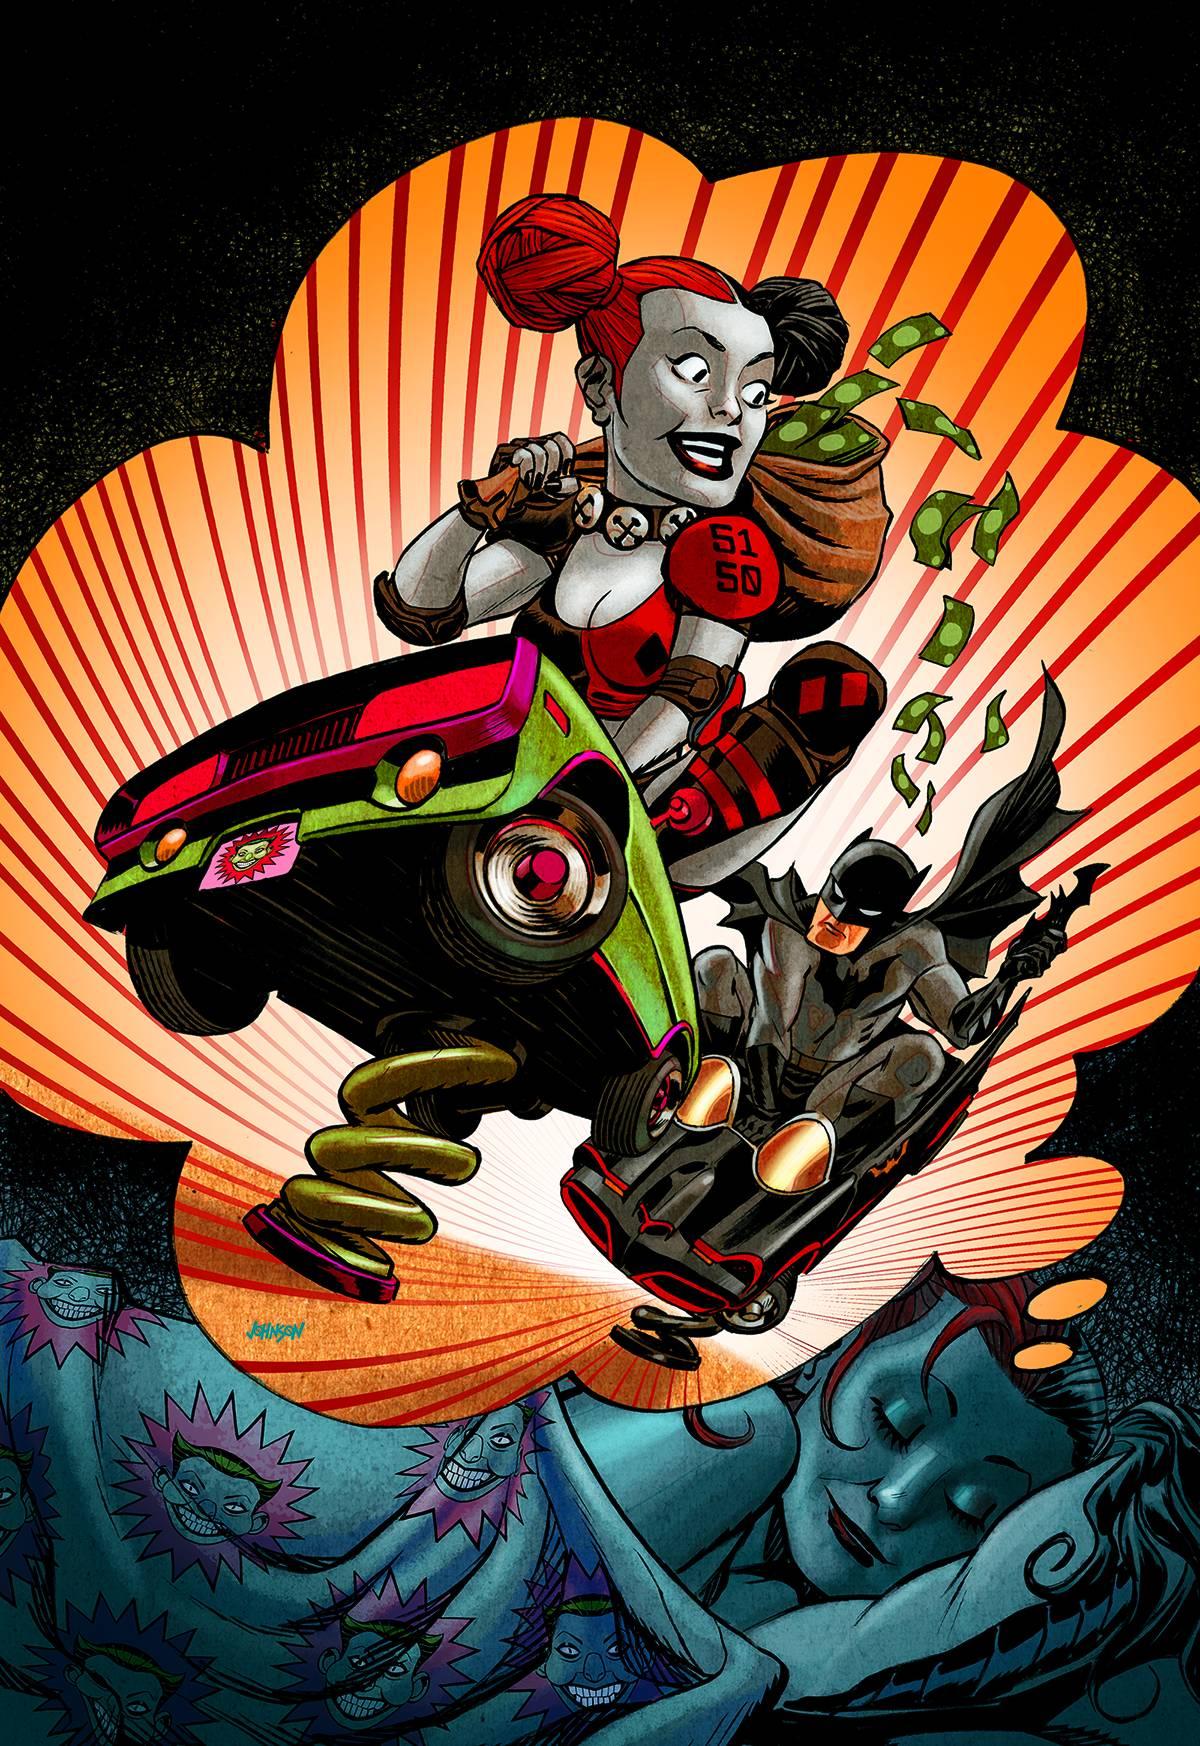 Harley Quinn Vol 2 8 Textless Batman 75th Anniversary Variant.jpg